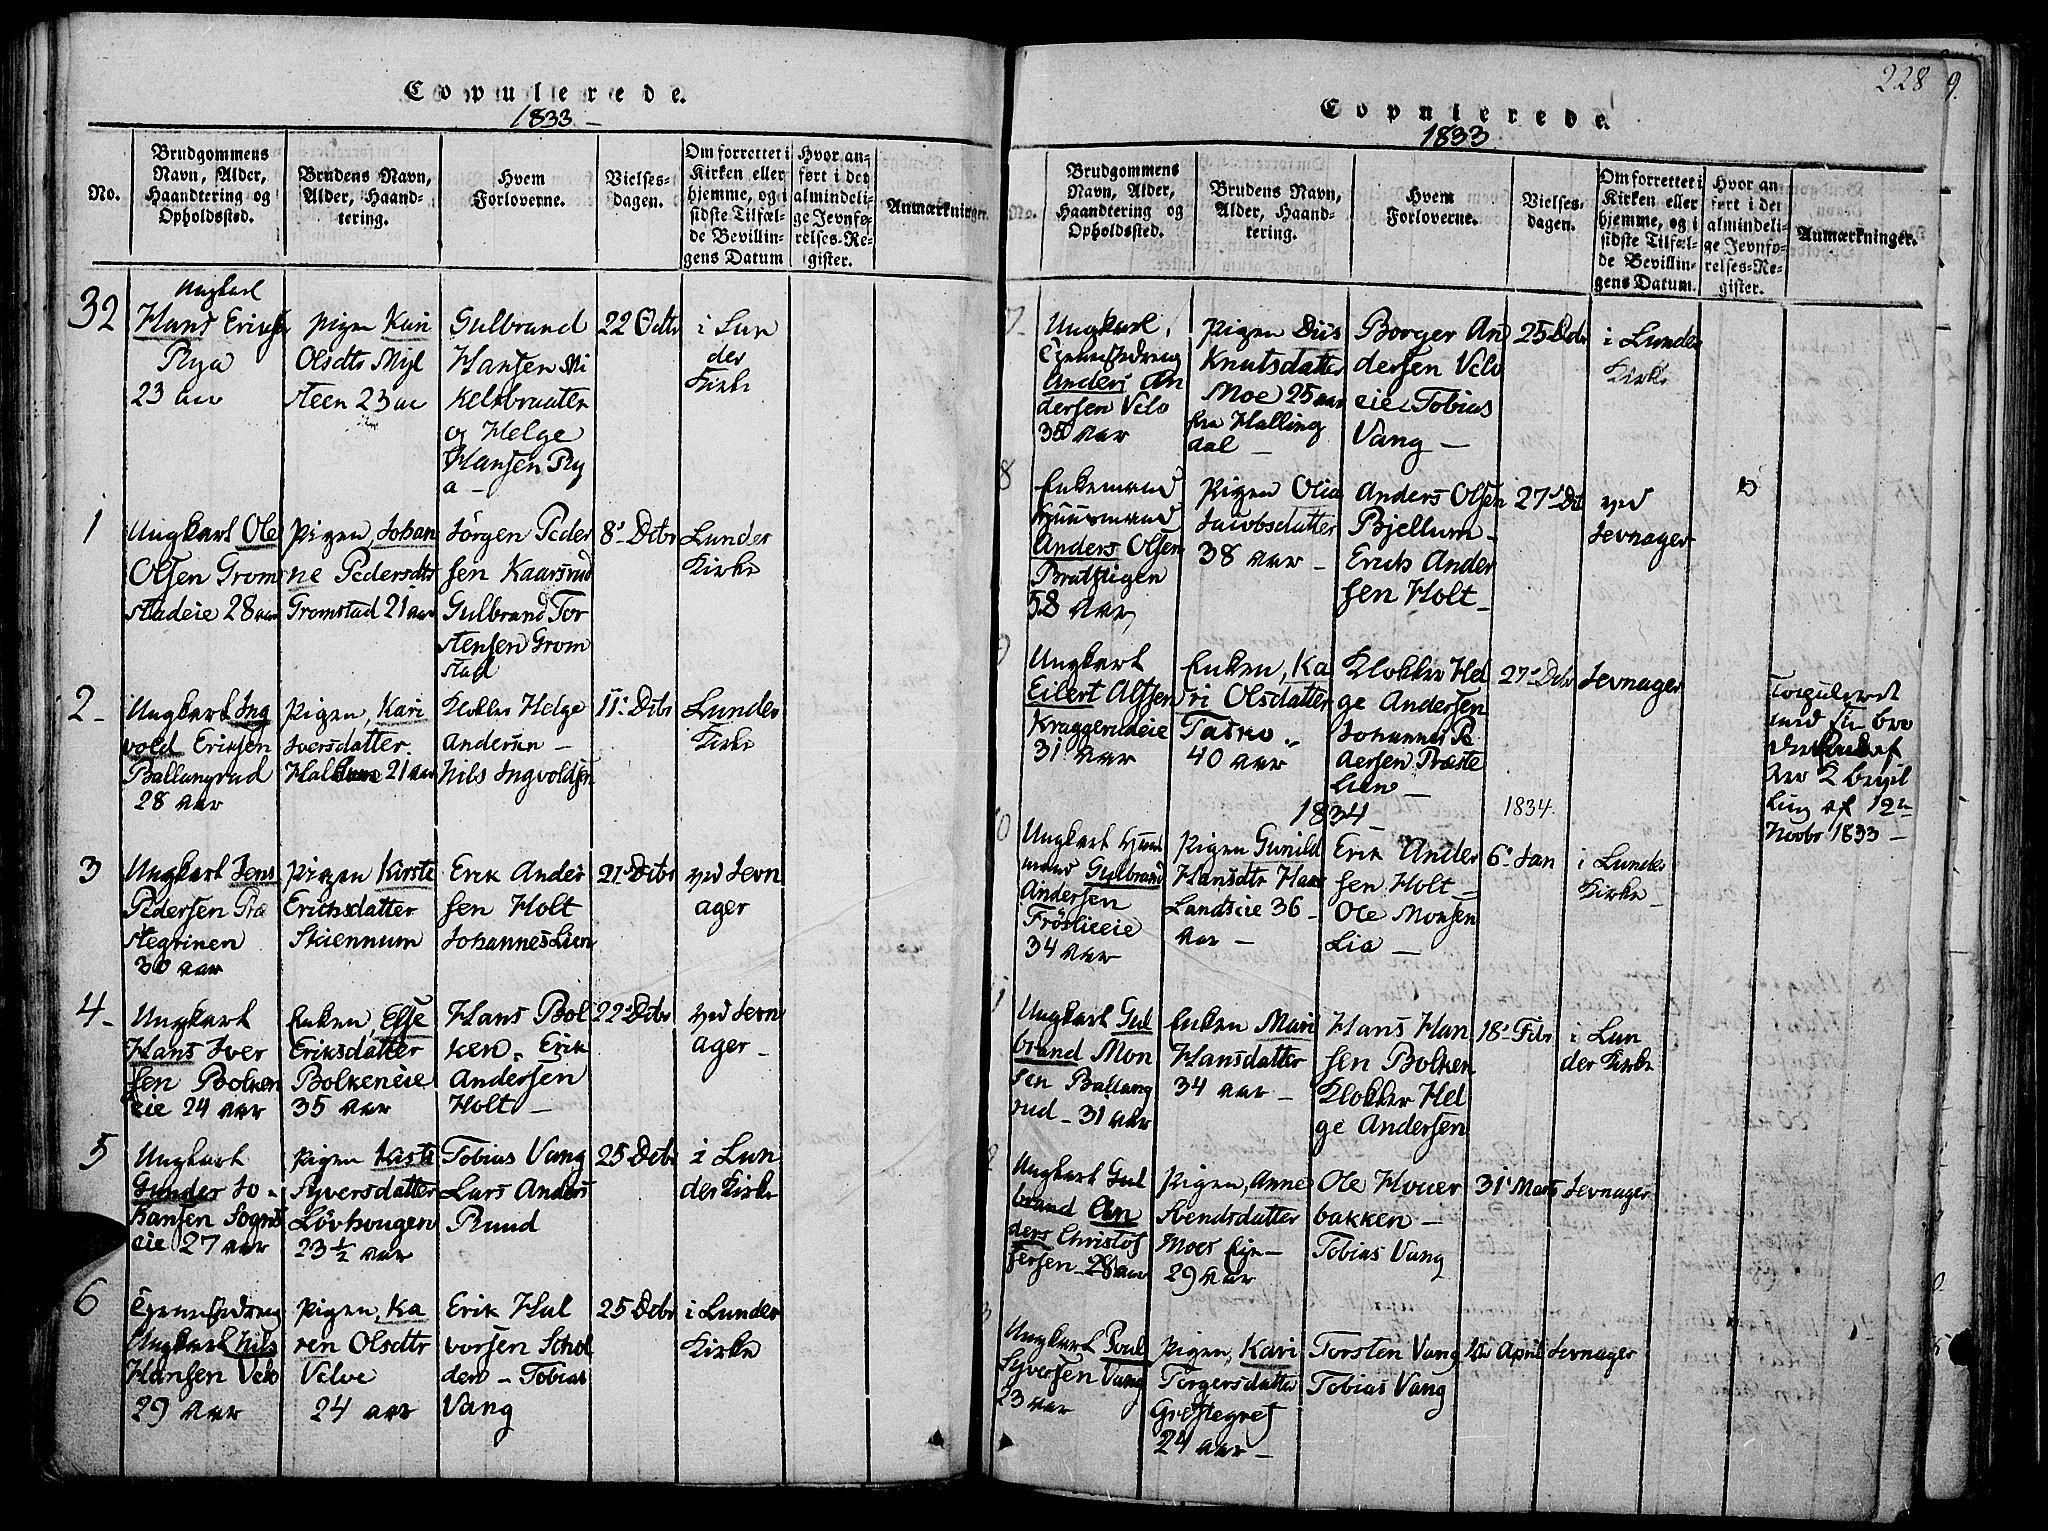 SAH, Jevnaker prestekontor, Ministerialbok nr. 5, 1815-1837, s. 228